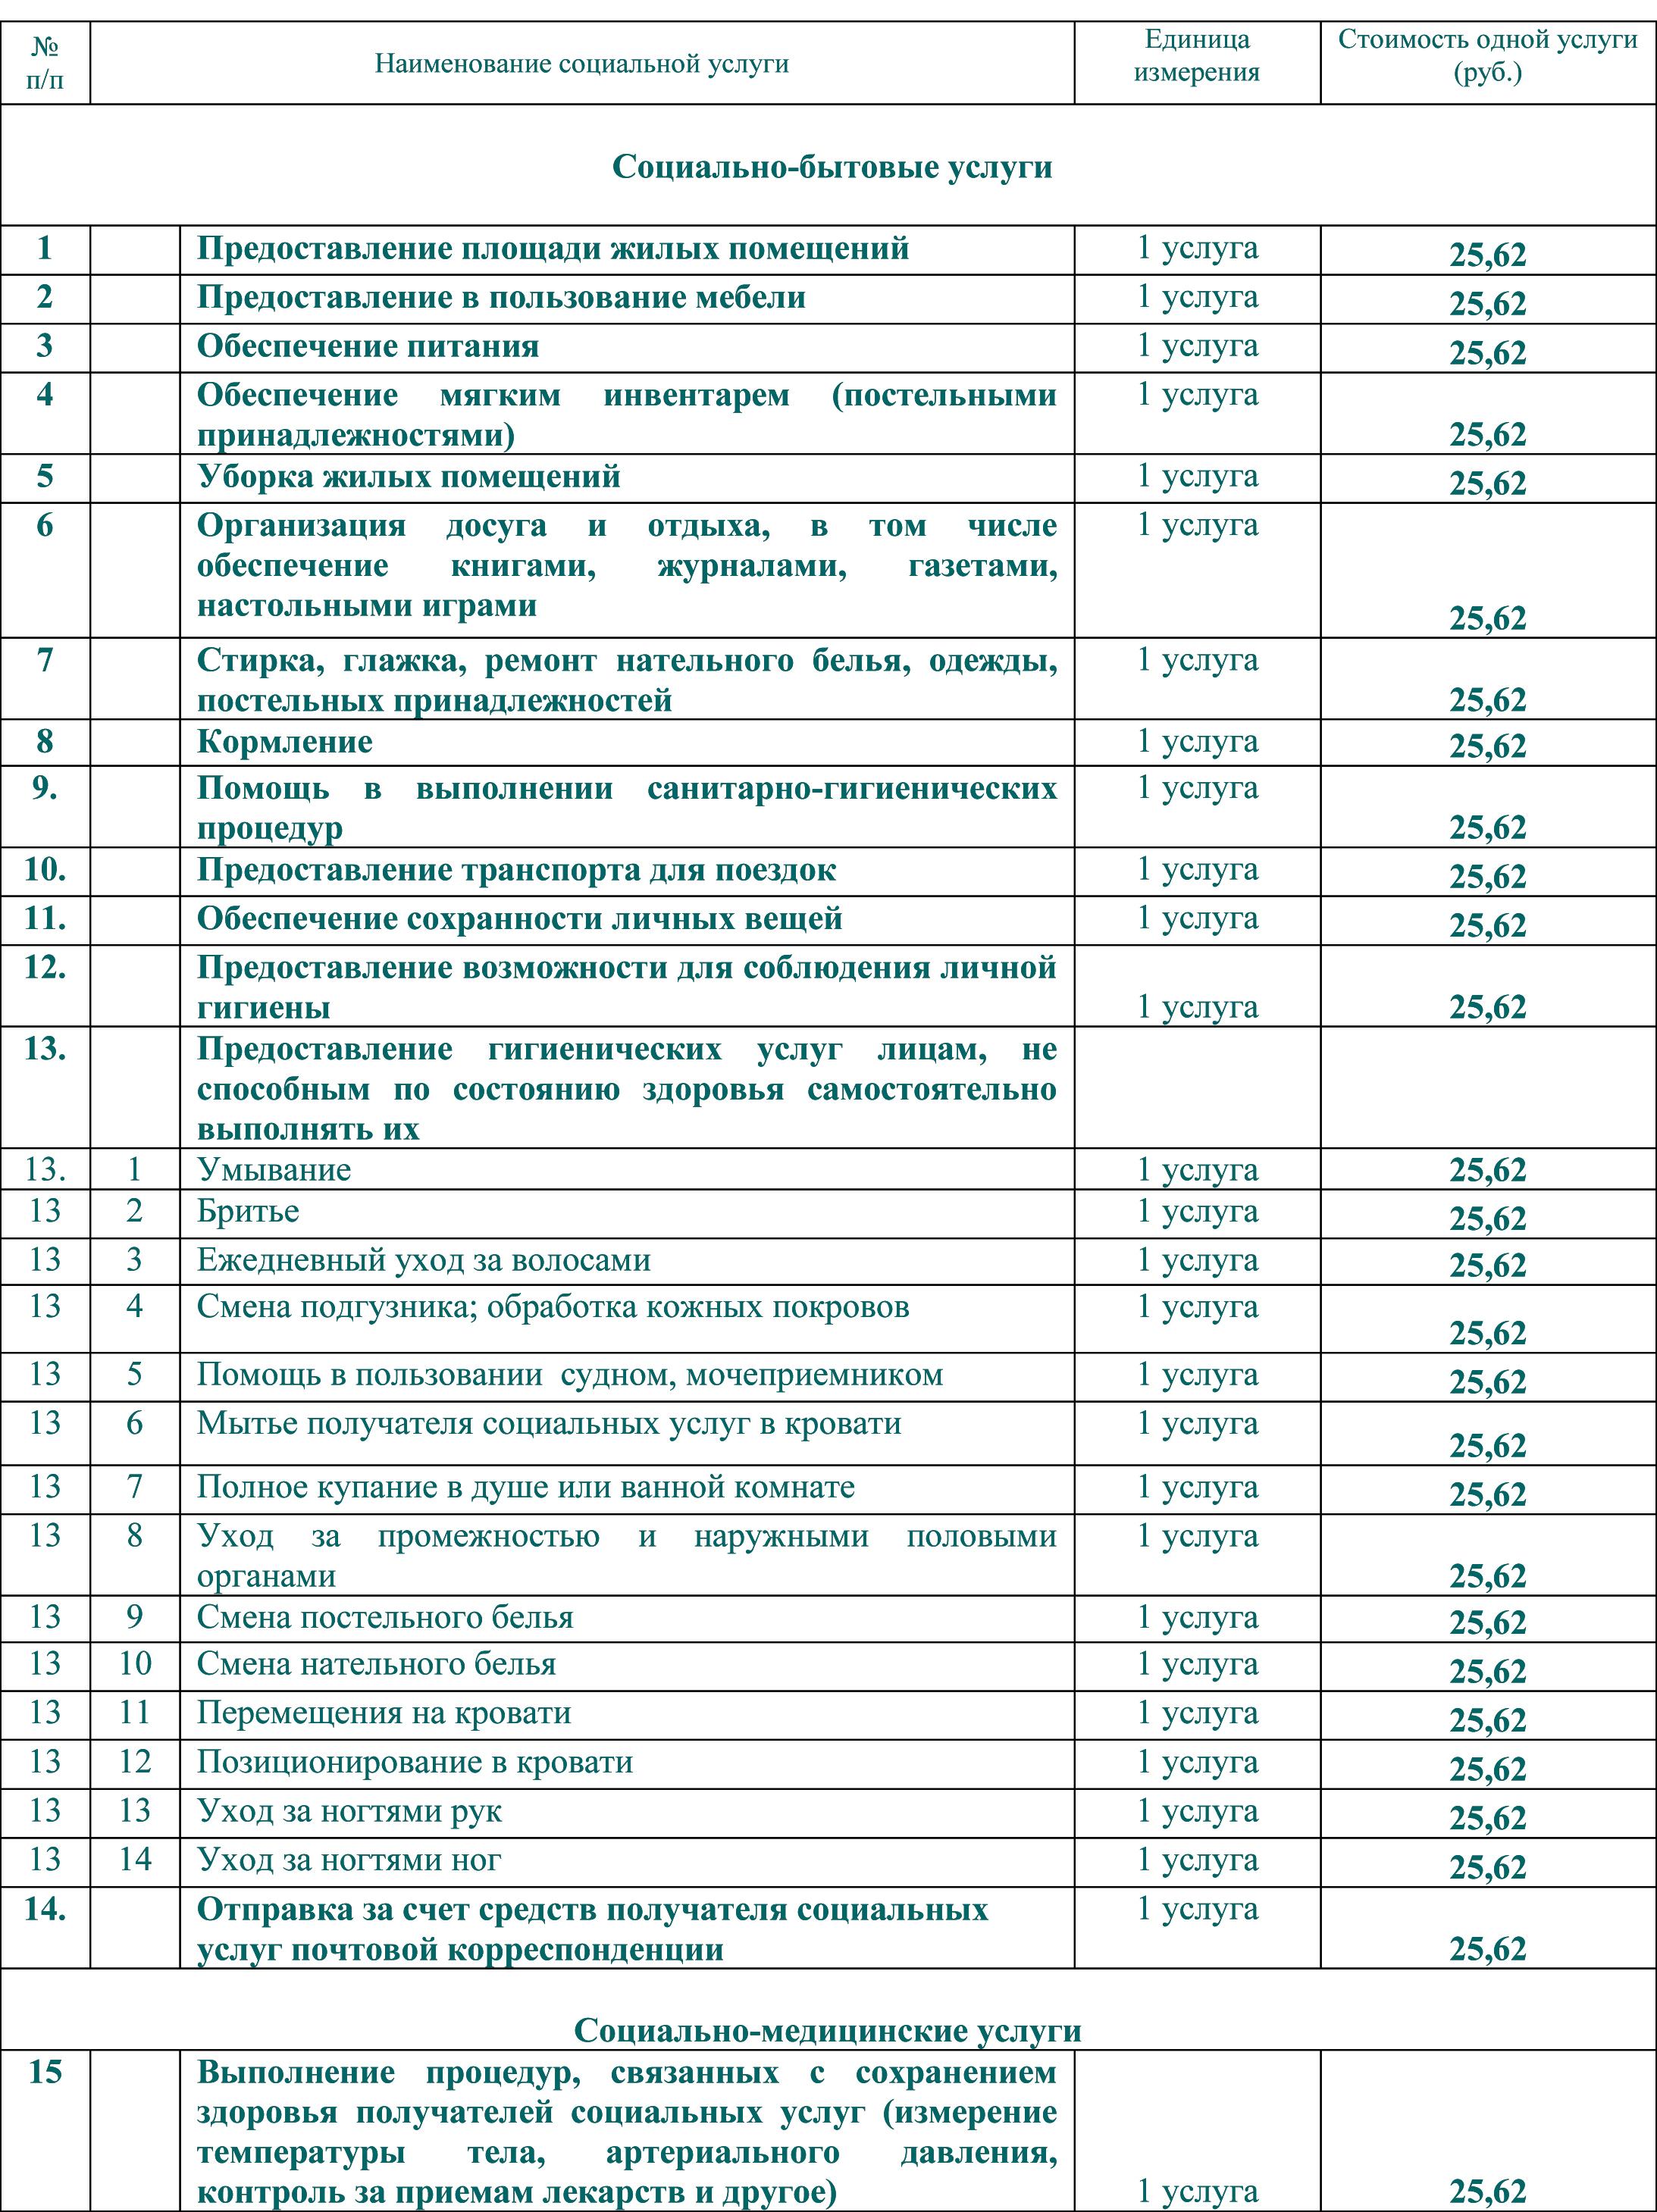 tarif-sro-csonekl-2019-1